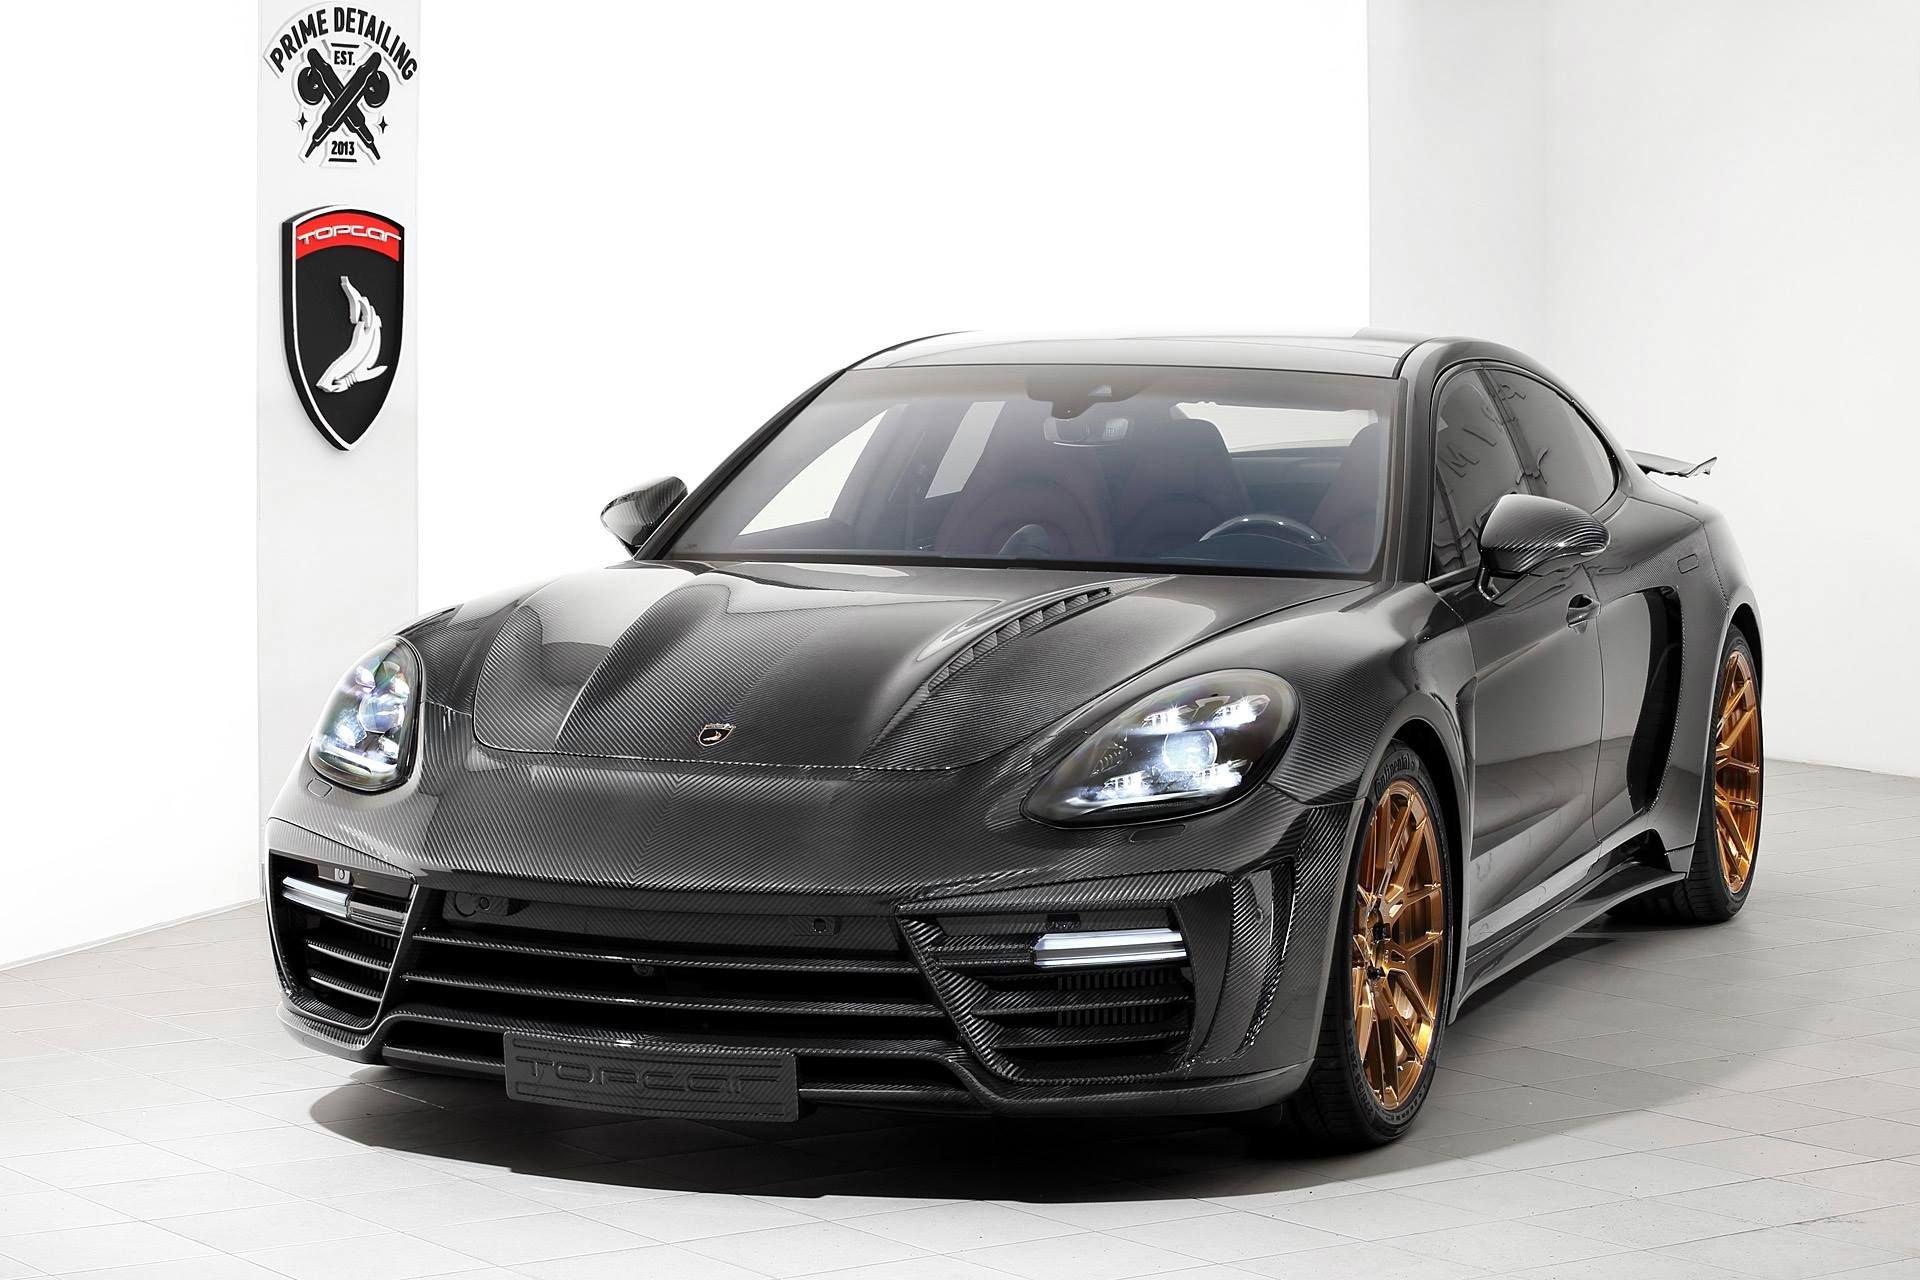 Porsche_Panamera_GTR_Carbon_Edition_by_TopCar_0001